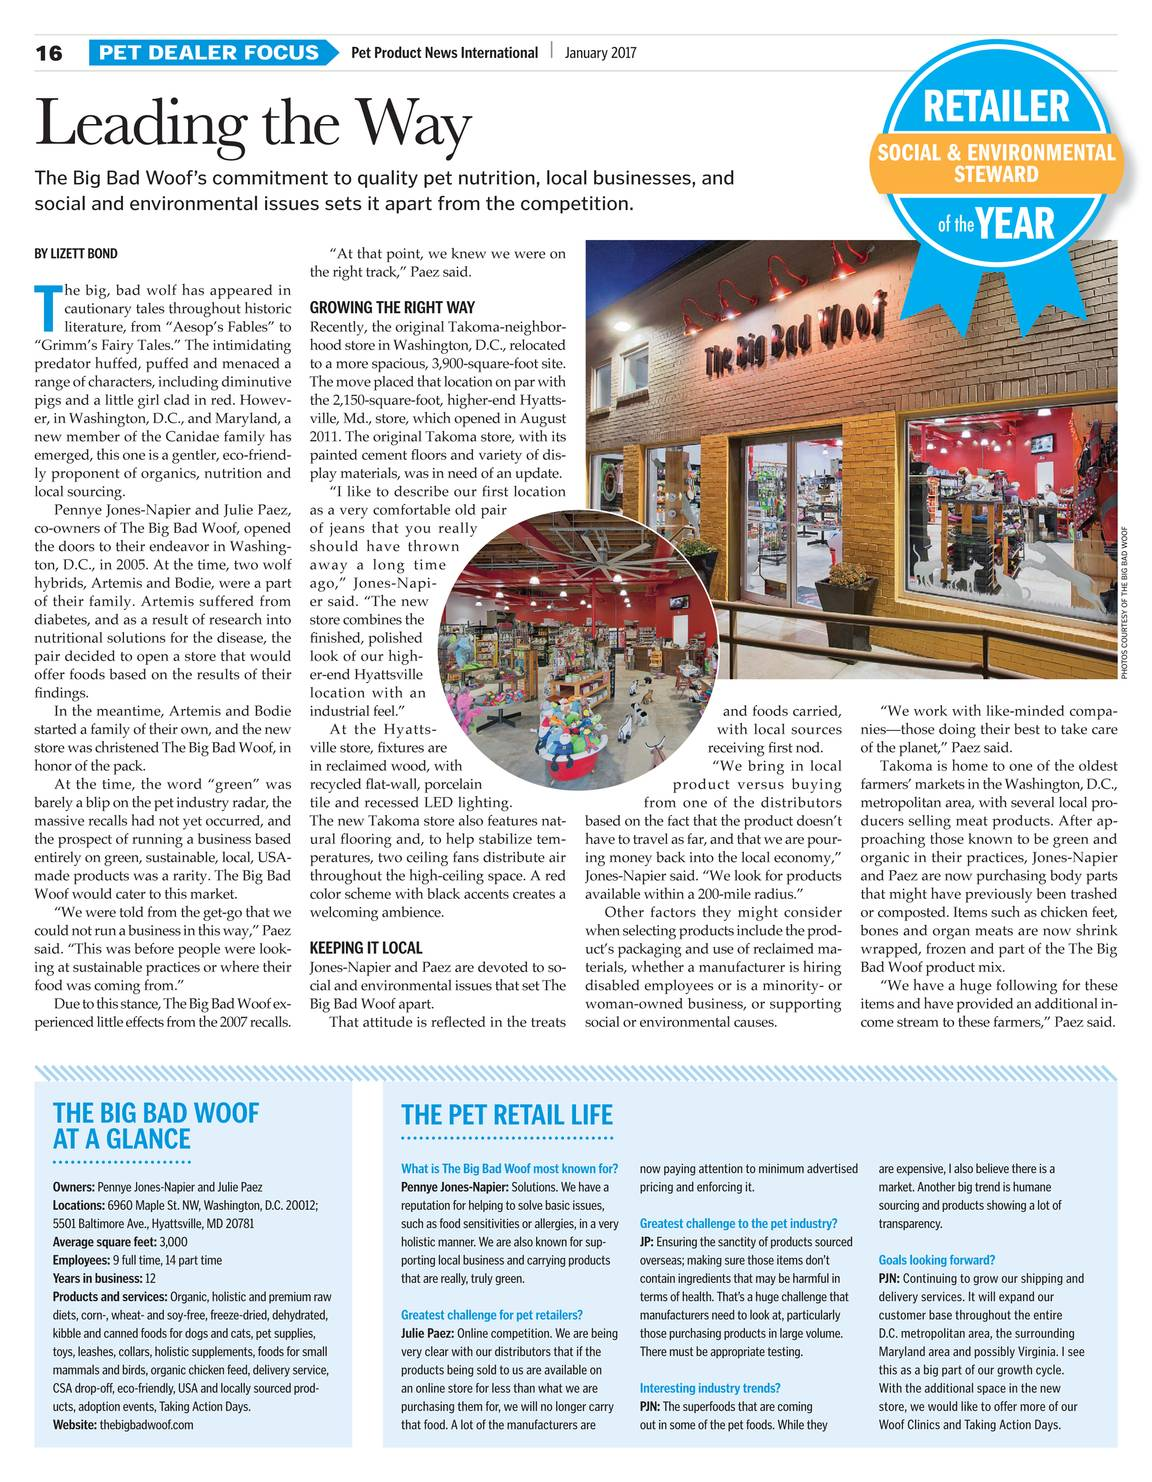 Pet Product News - January 2017 - page 16